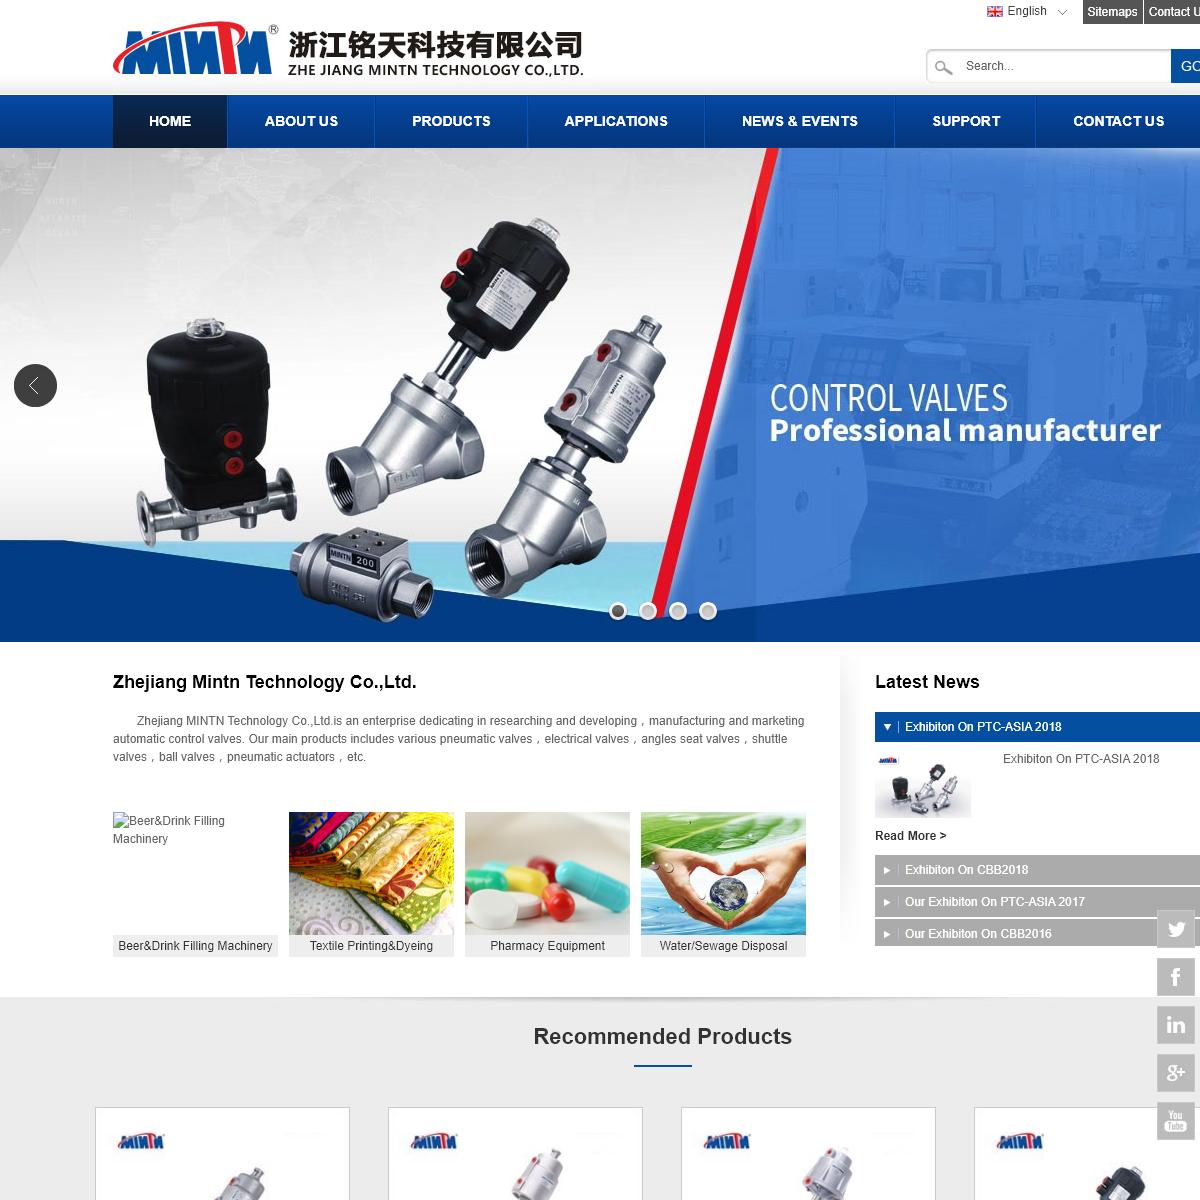 Zhejiang Mintn Technology Co.,Ltd.